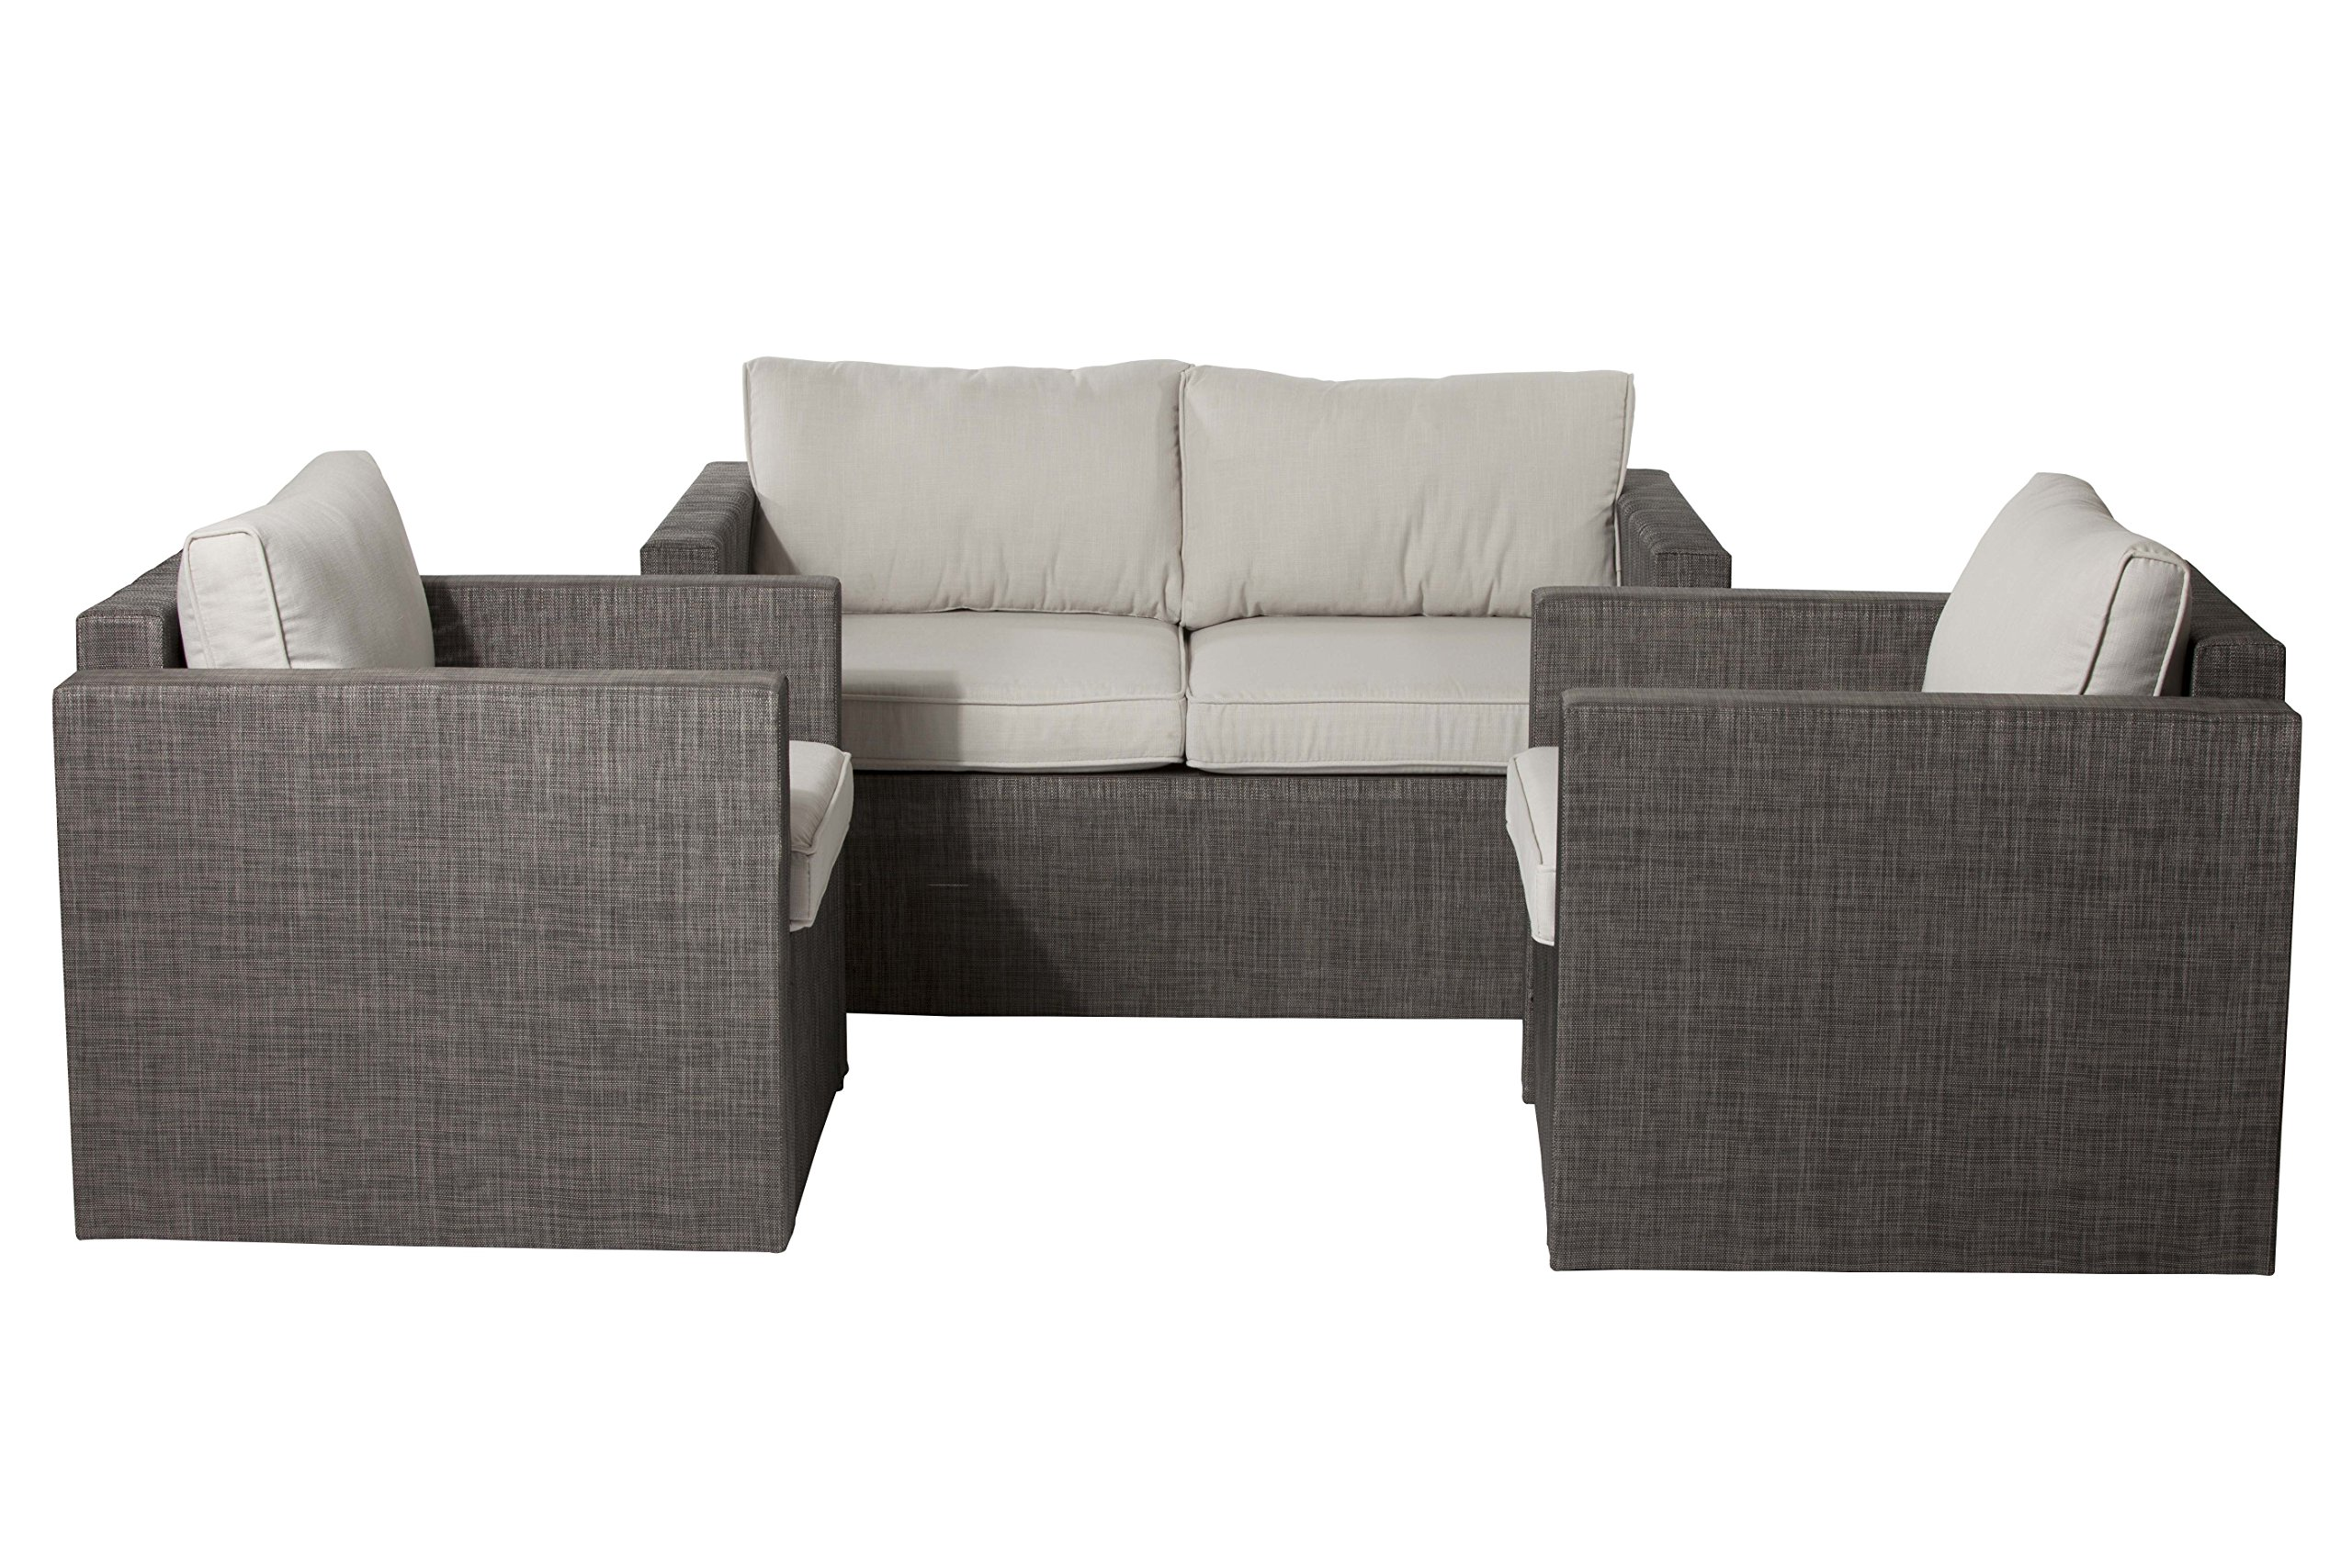 Pangea Home 1+2 Lion Sofa Set Textilene Gold, White - Manufacturer: Pangea Home Material Type: aluminum Color NAME: White - patio-furniture, patio, conversation-sets - 91H0rs fmBL -